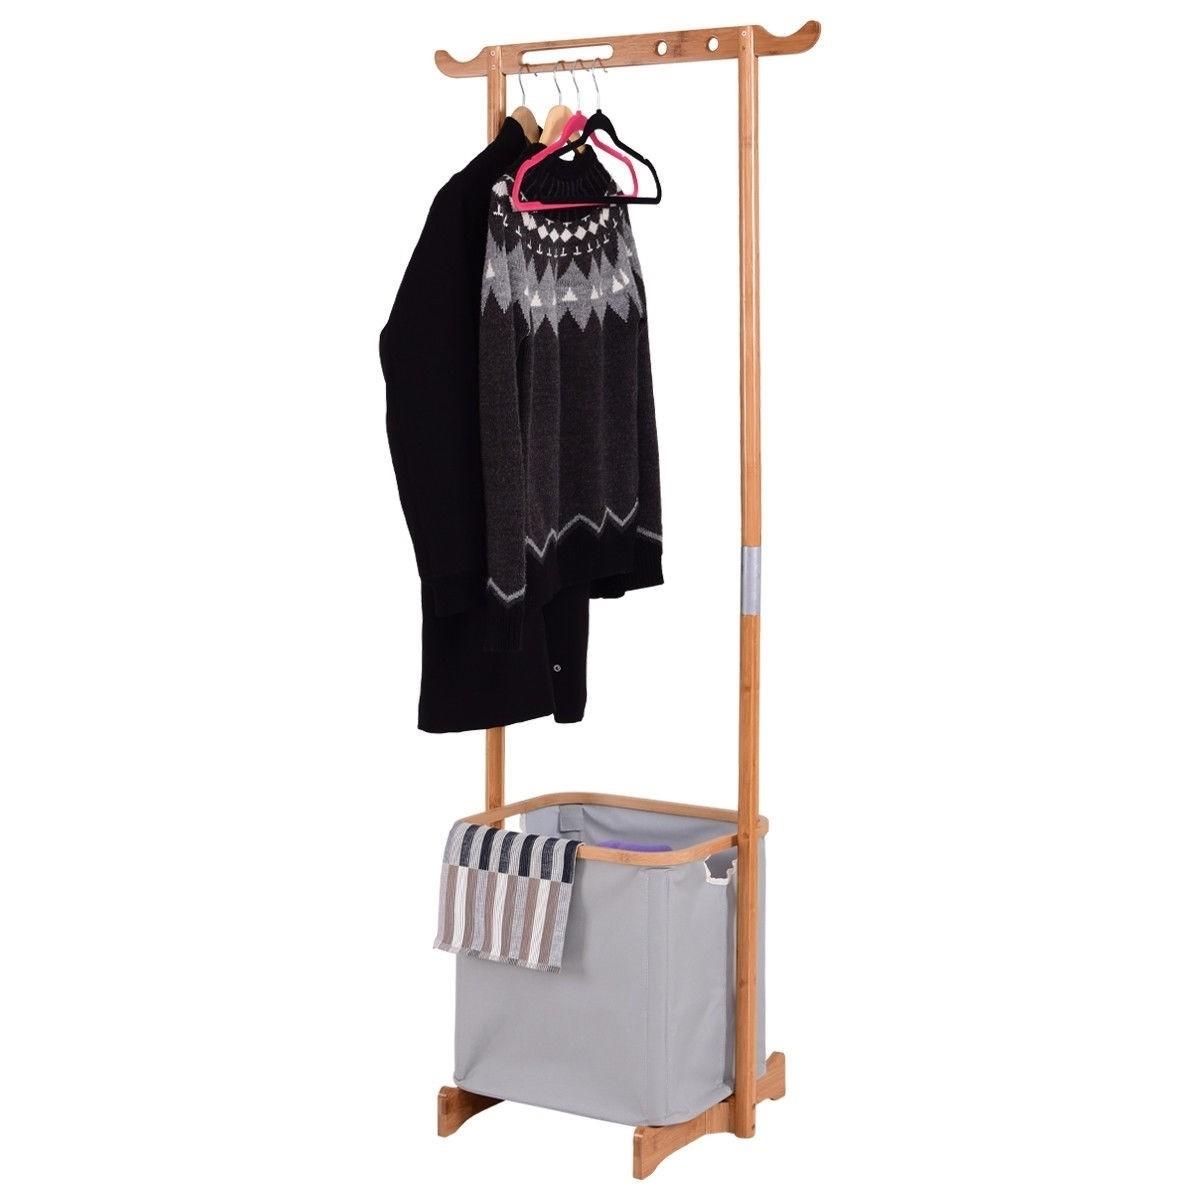 Bamboo Frame Laundry Hamper Basket with Garment Rack Clothes Hanger